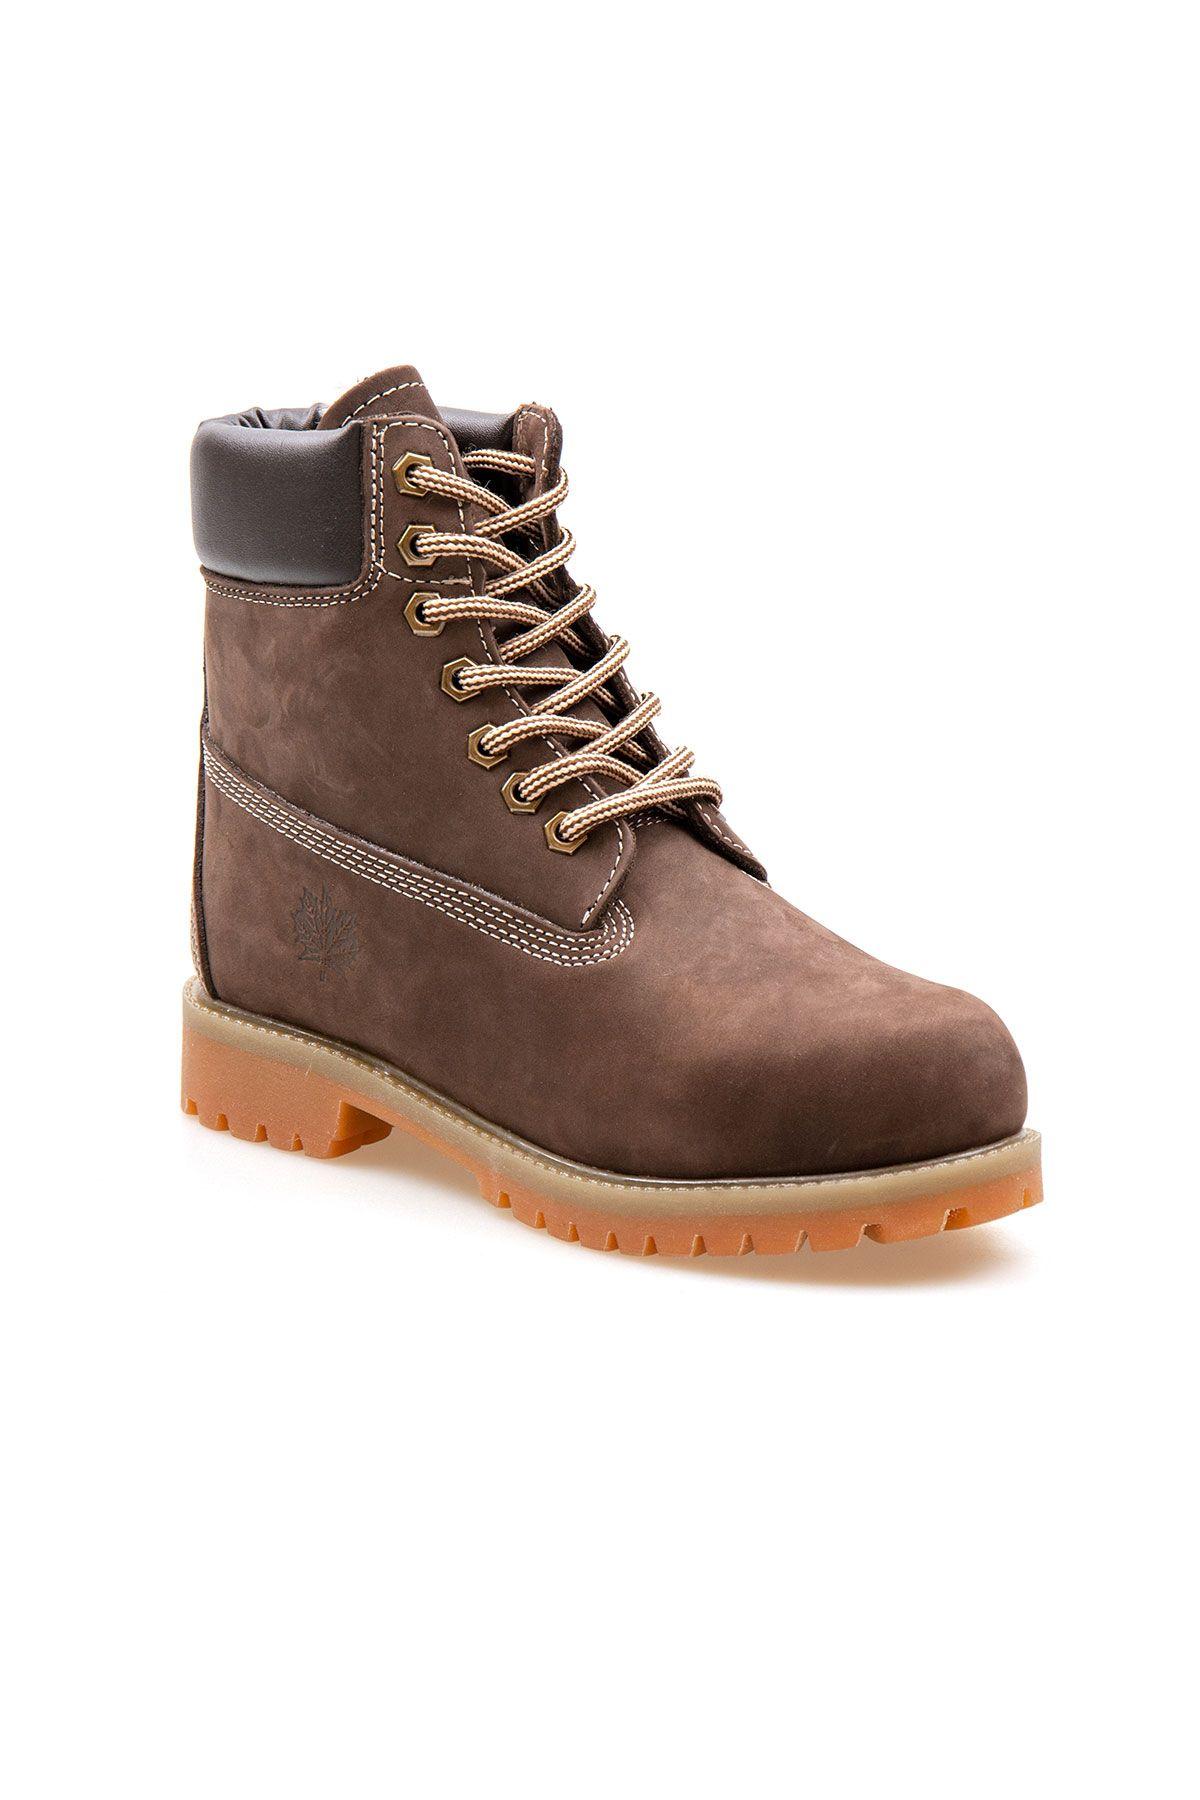 Pegia Genuine Nubuck Women's Boots 500800 Brown